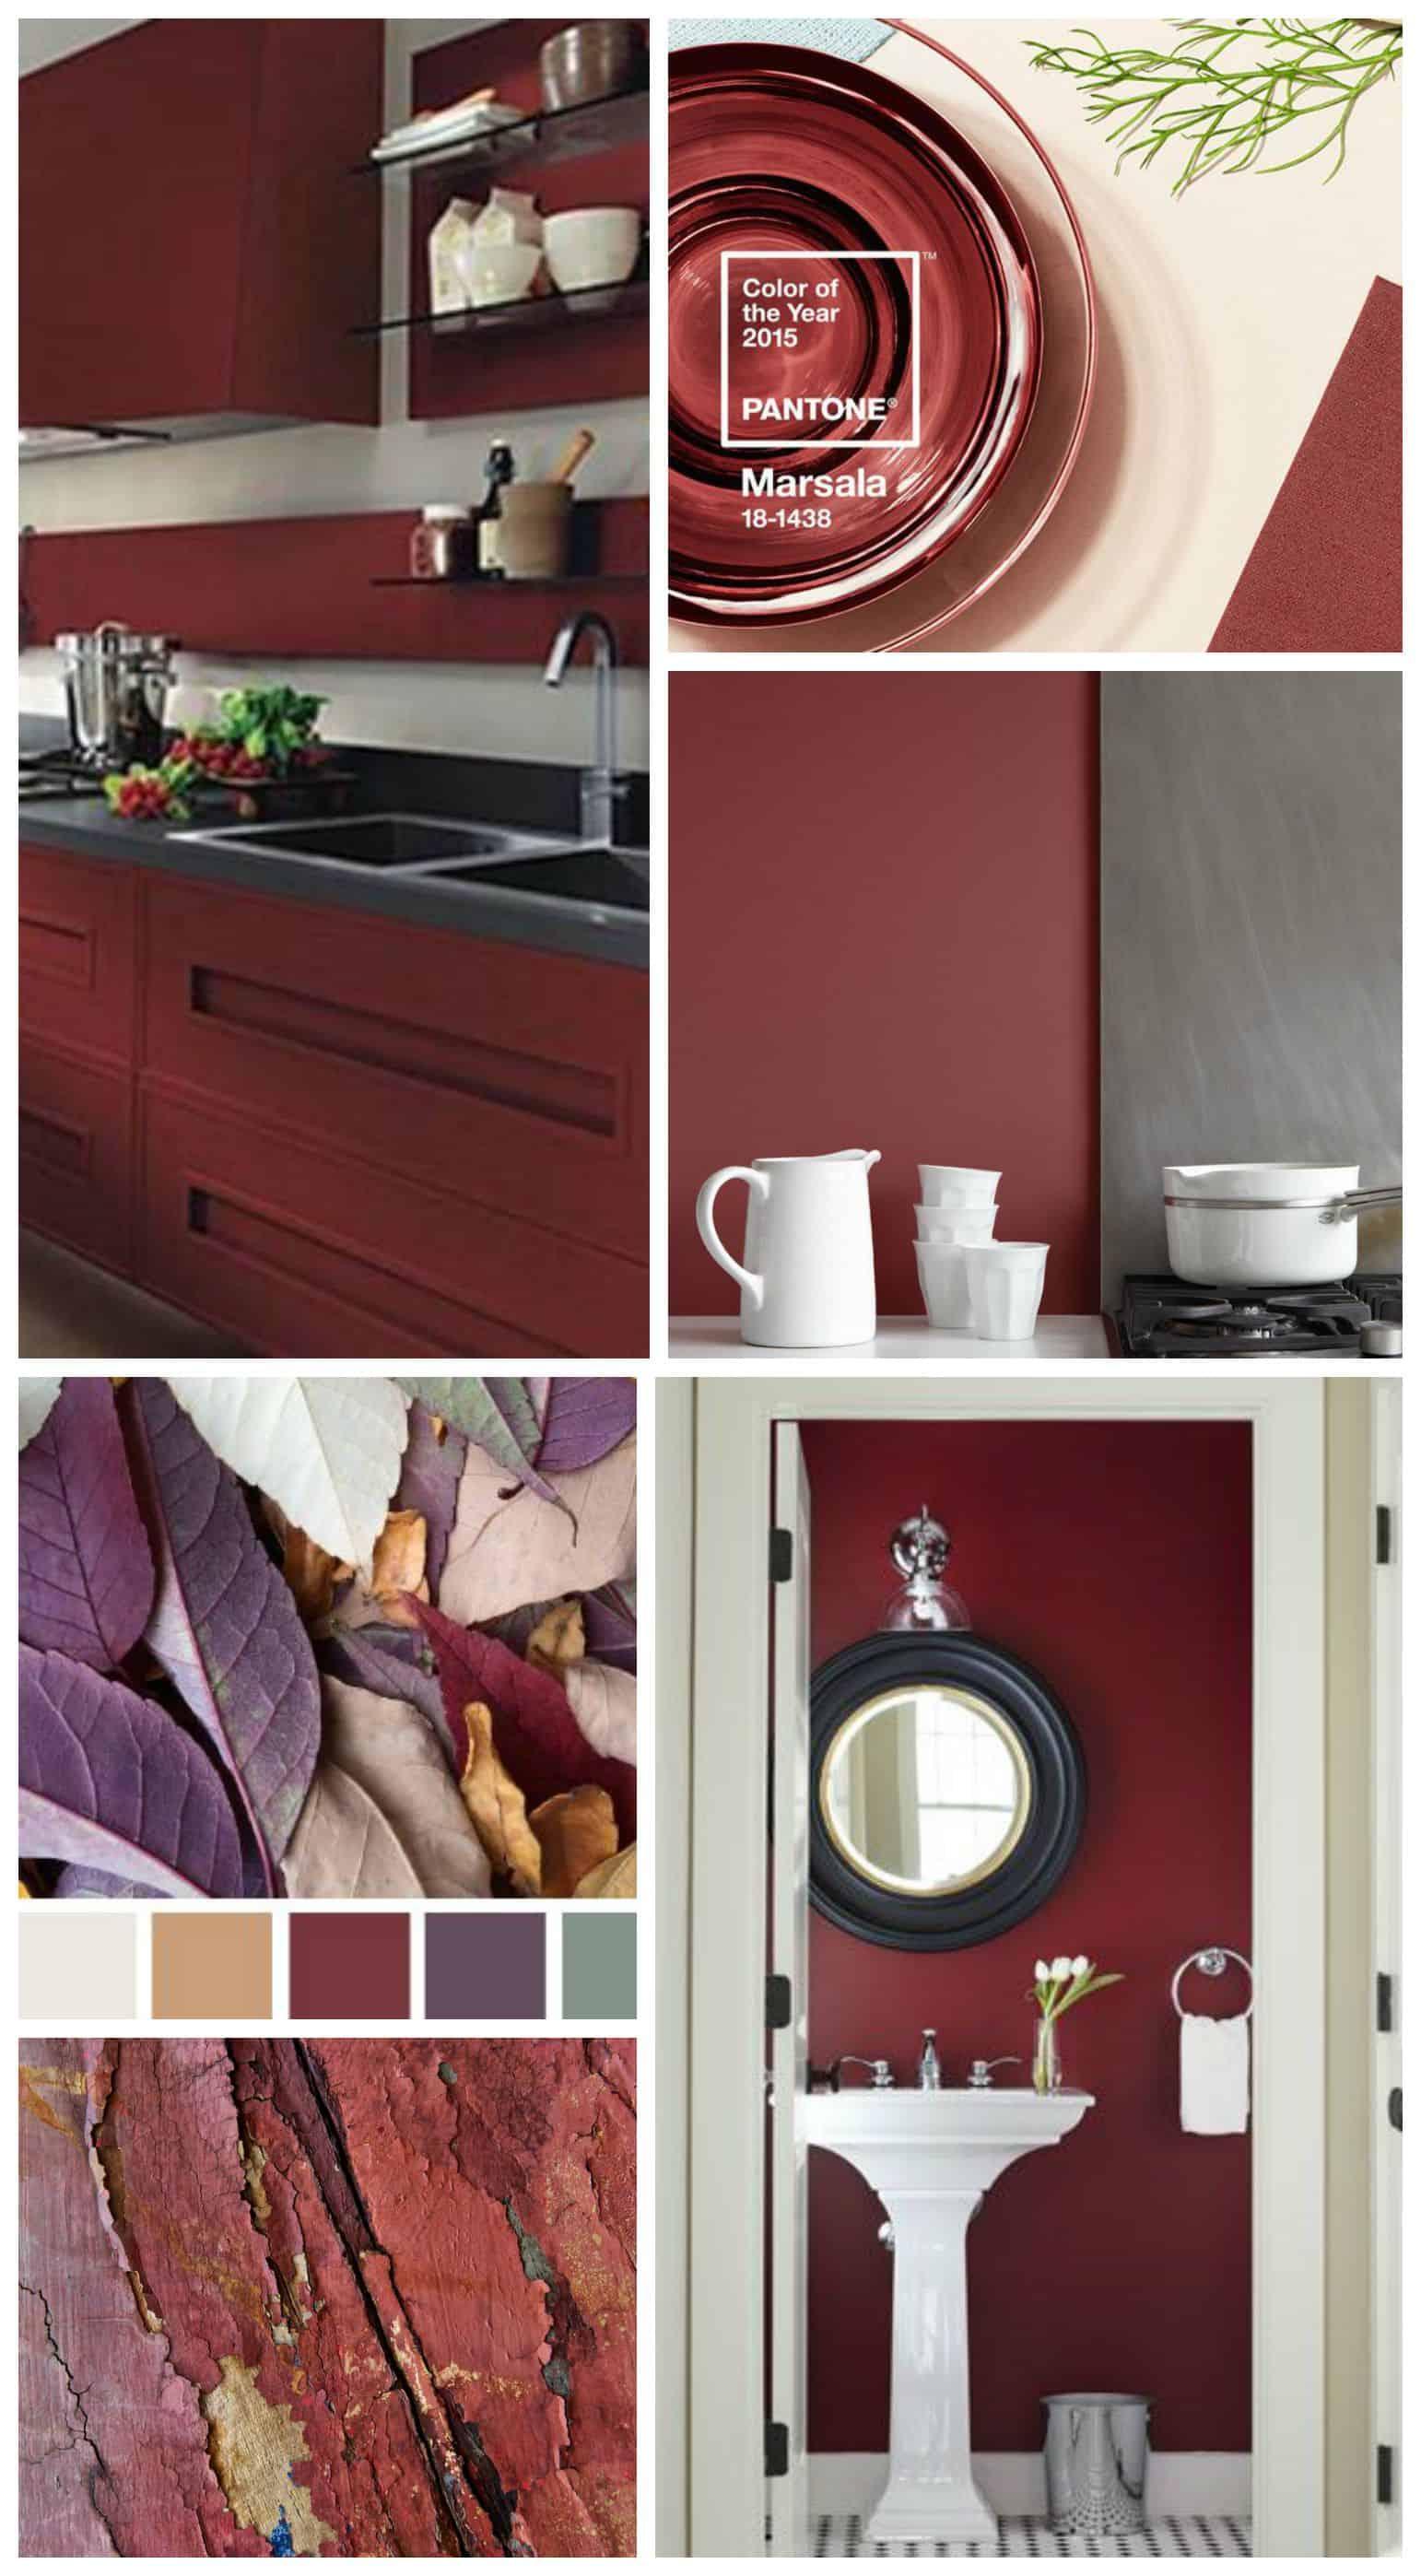 Pin Idee Arredo On Pinterest Mindoro Cucina And Issey Miyake Wallpaper  #913D3A 1542 2795 Idee Colore Sala Da Pranzo